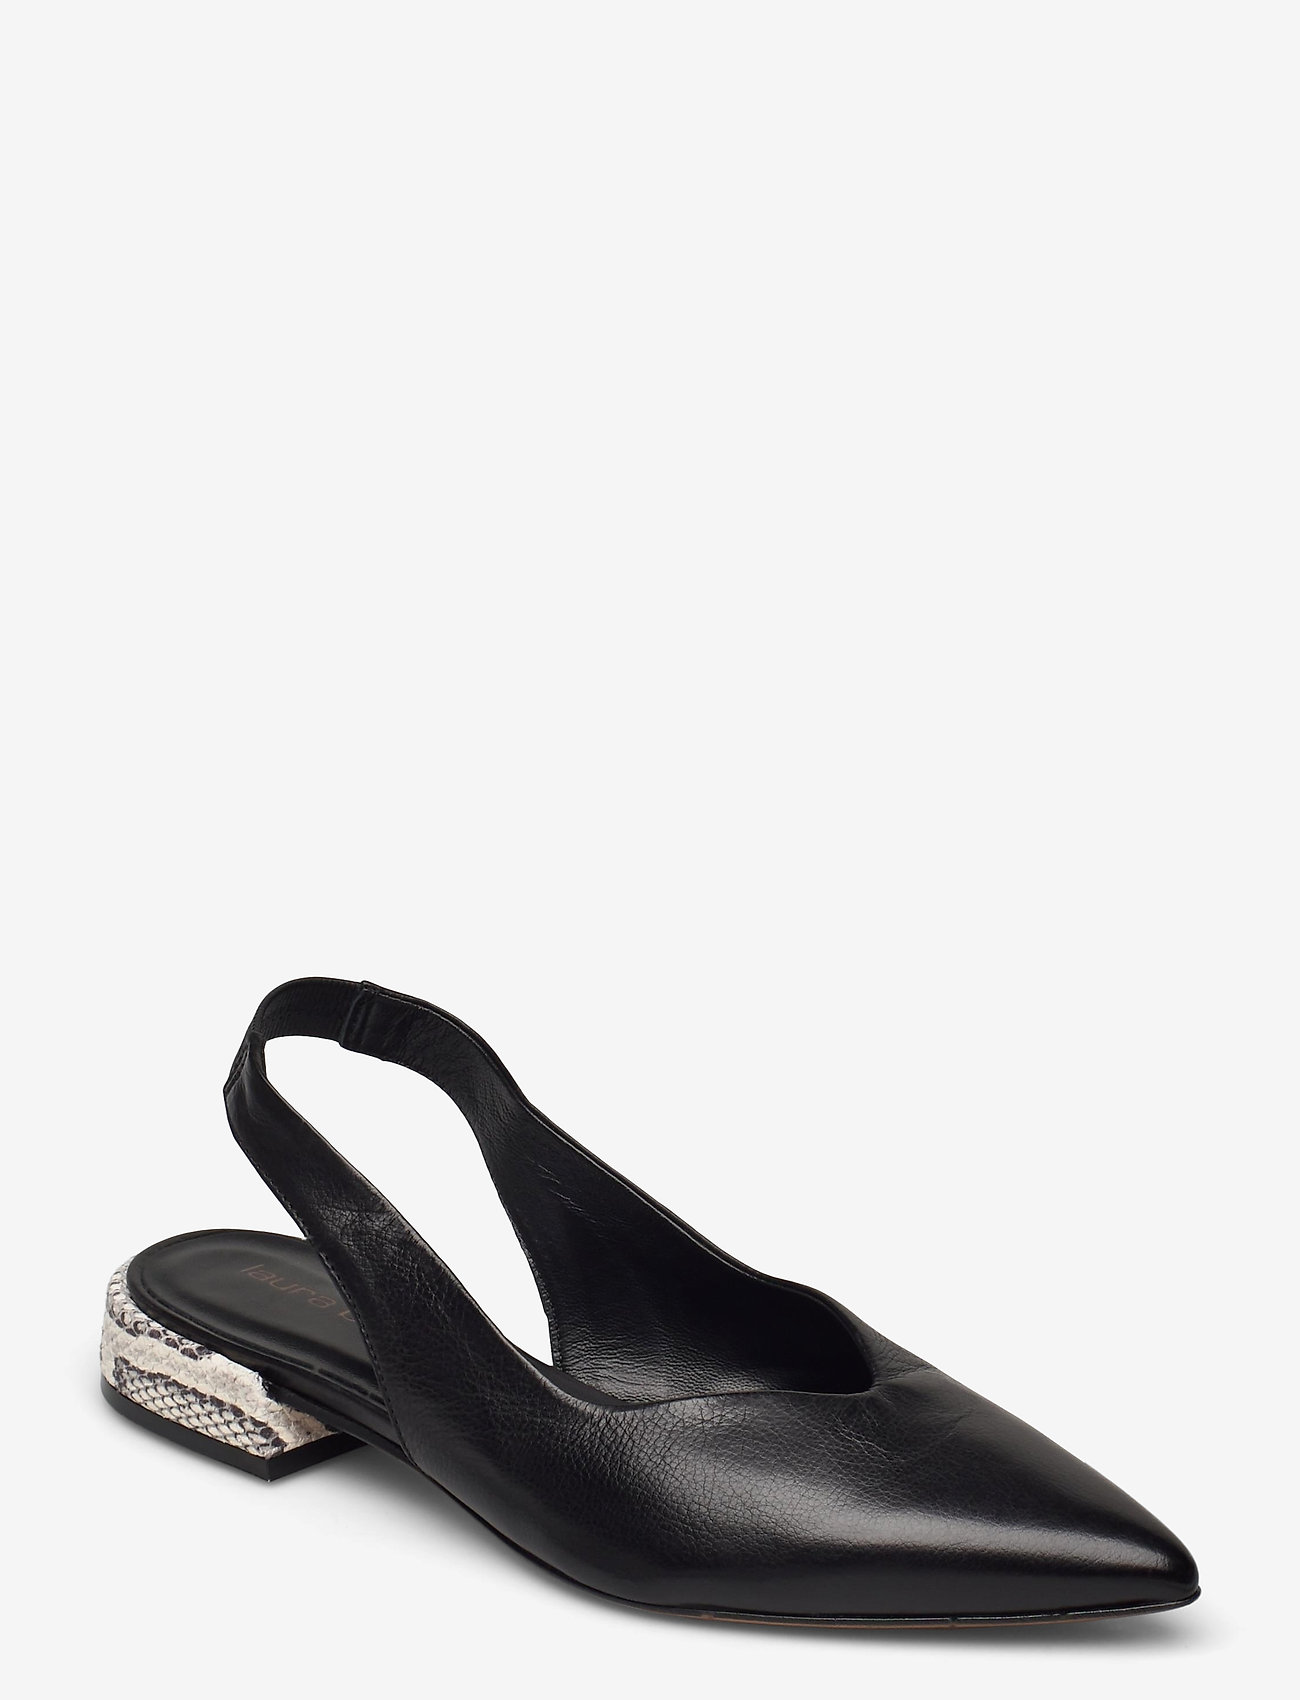 Laura Bellariva - Flats - ballerinas - nero/roccia - 0